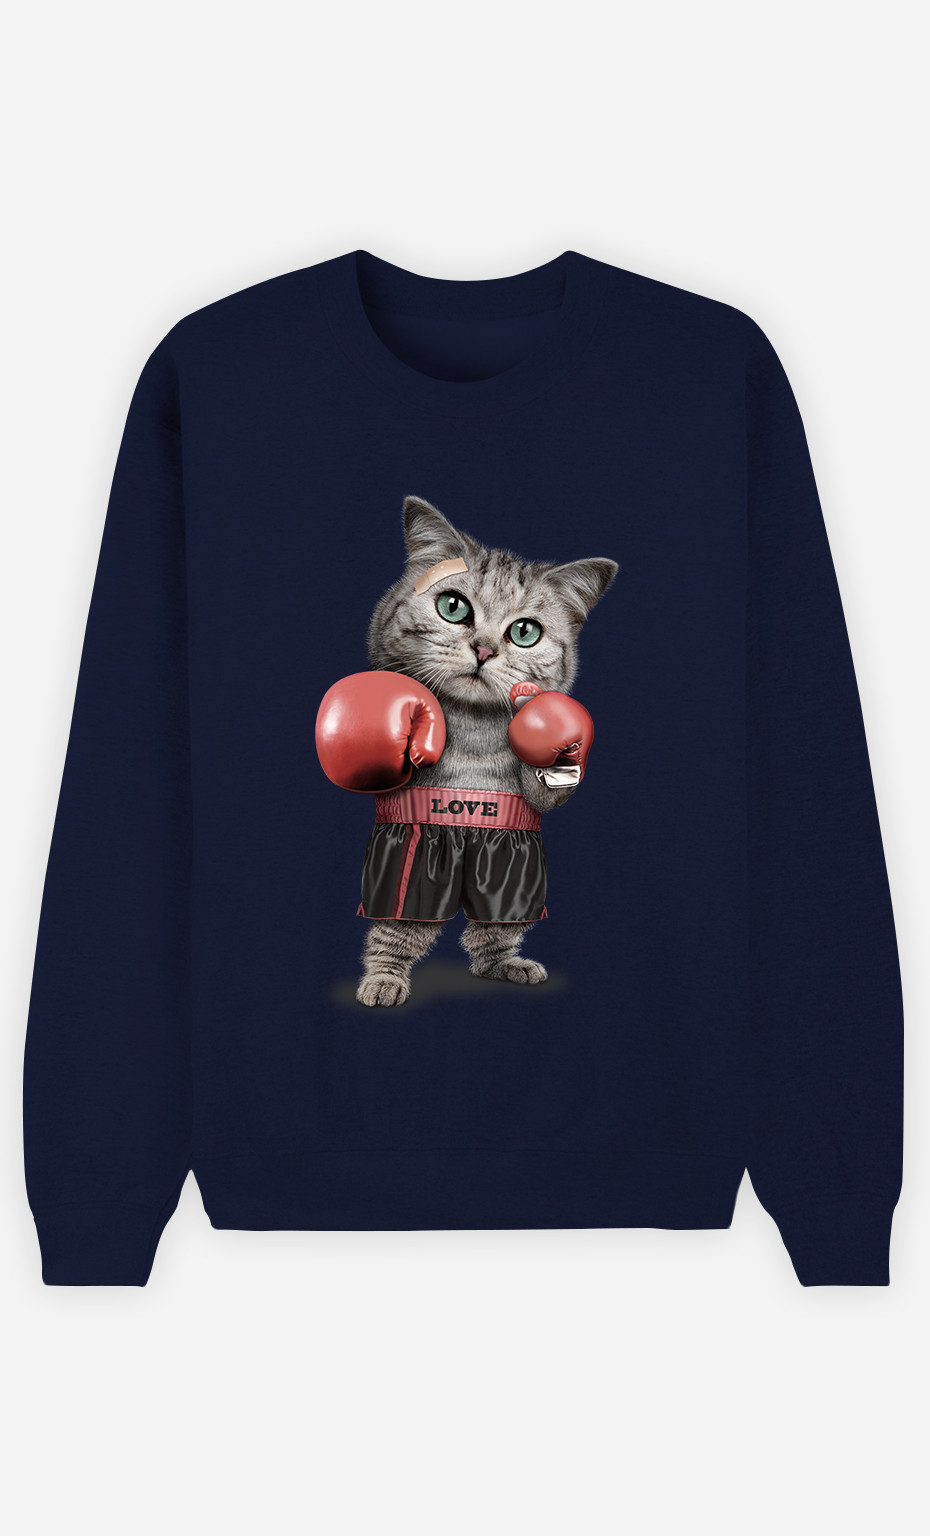 Sweatshirt Boxing cat